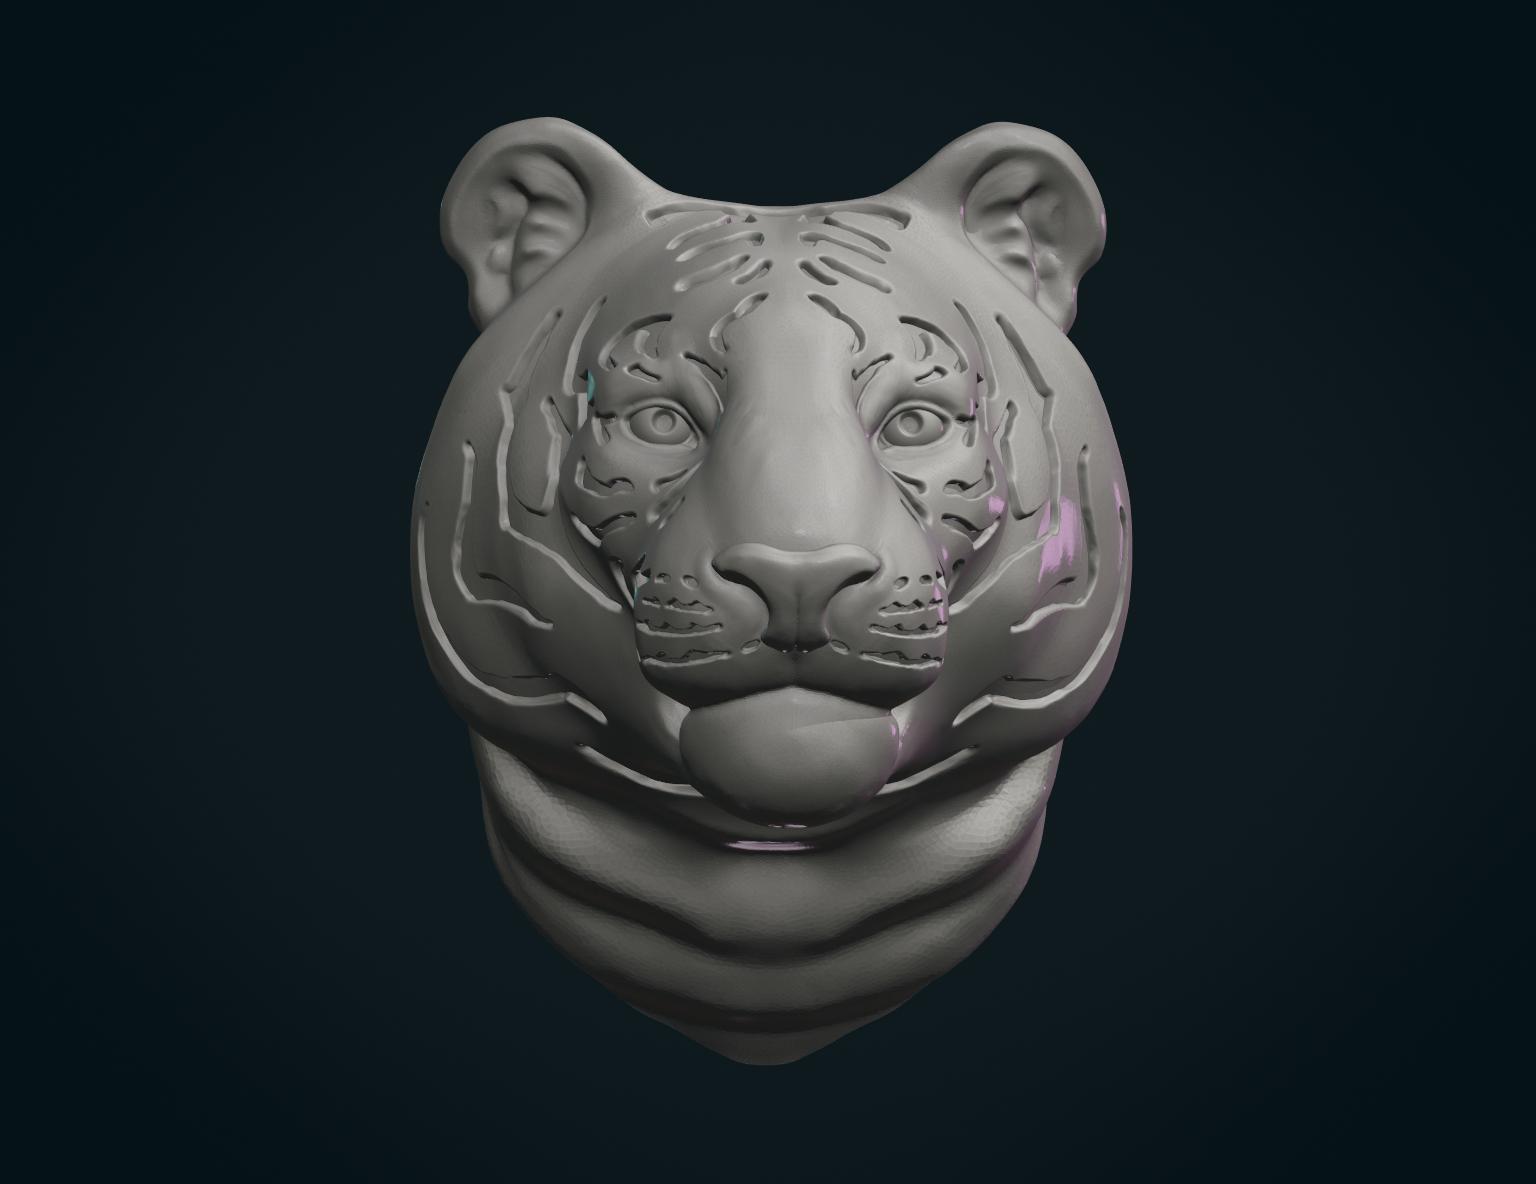 3D Printed Tiger Head by Skazok